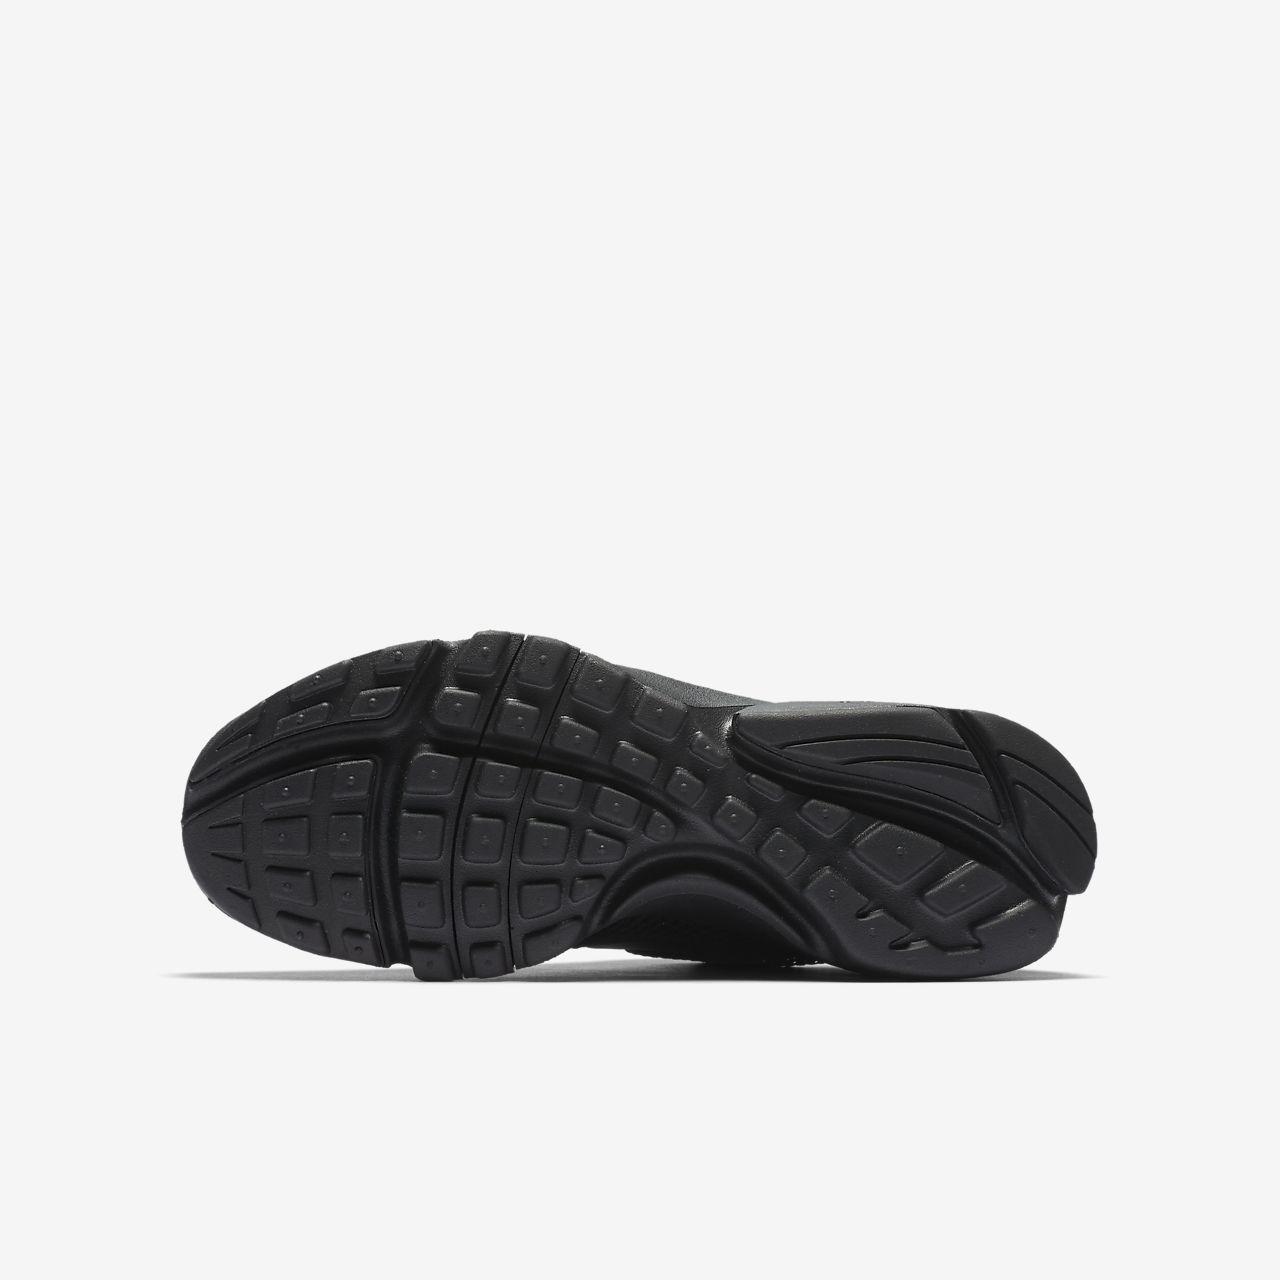 the latest 8c49c 83d39 ... Nike Presto Fly Older Kids Shoe